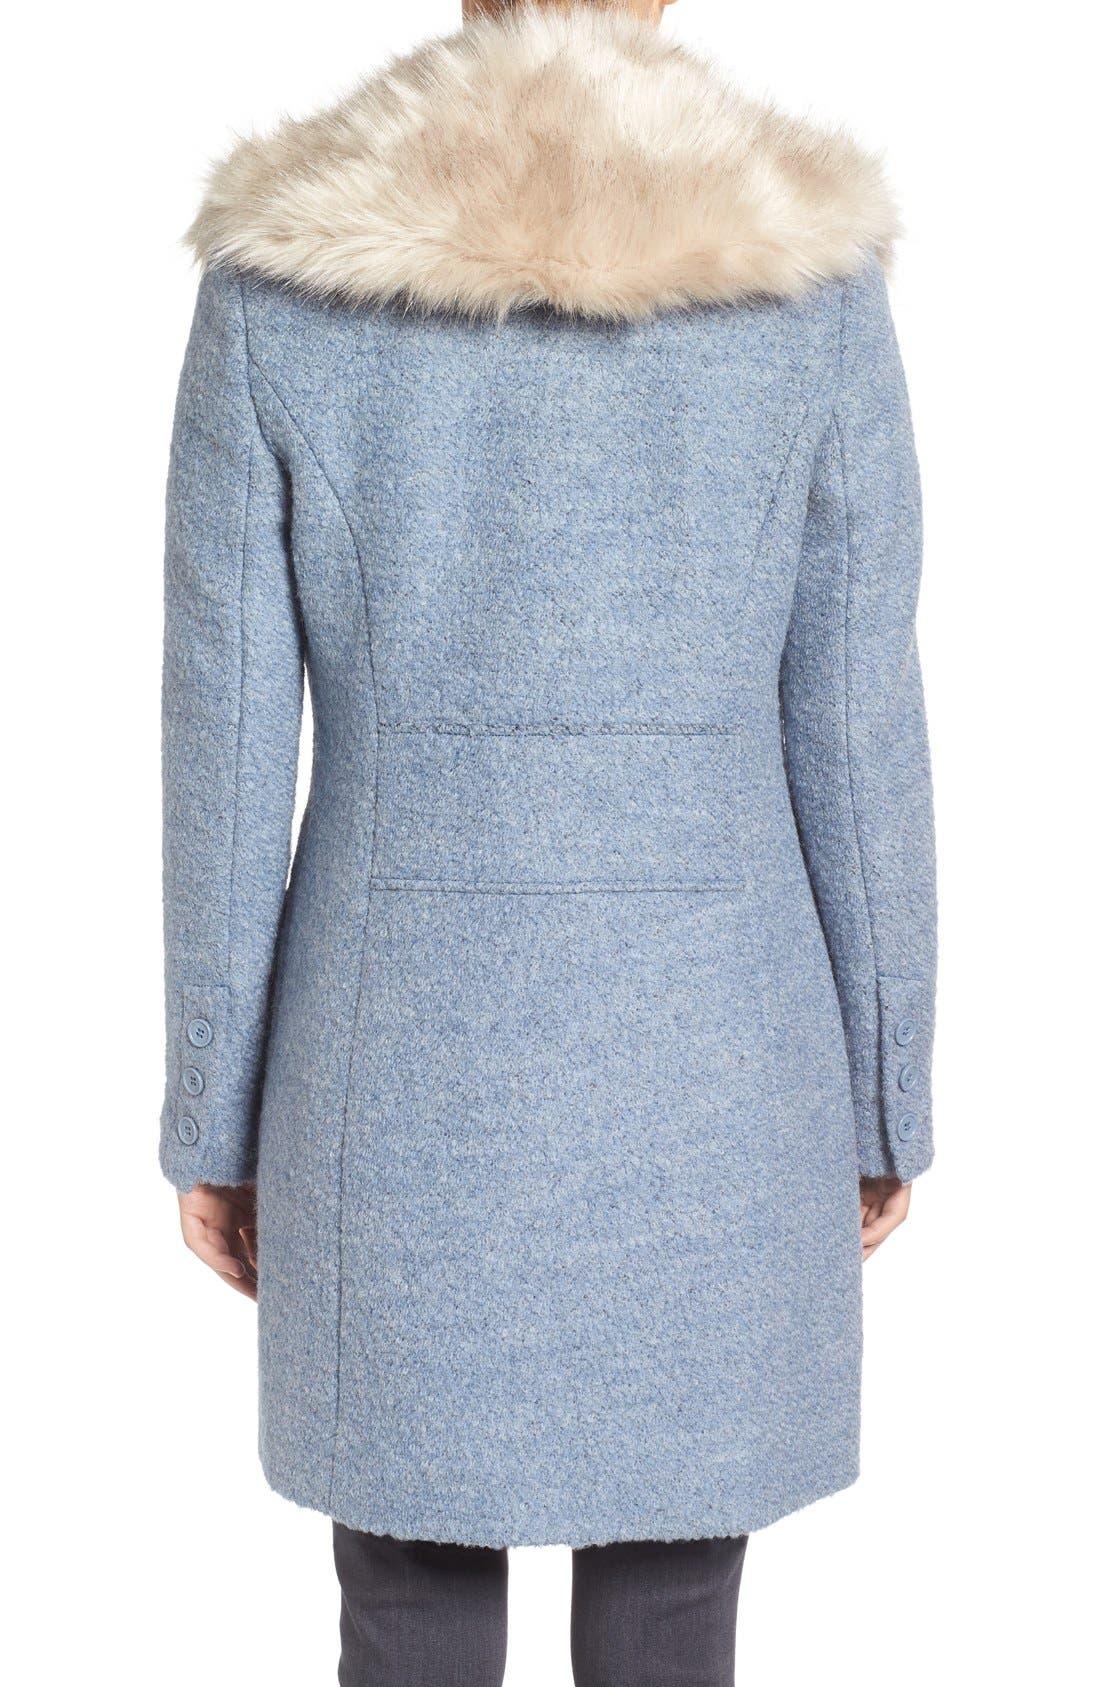 Alternate Image 2  - Belle Badgley Mischka 'Holly' Faux Fur Collar Bouclé Coat